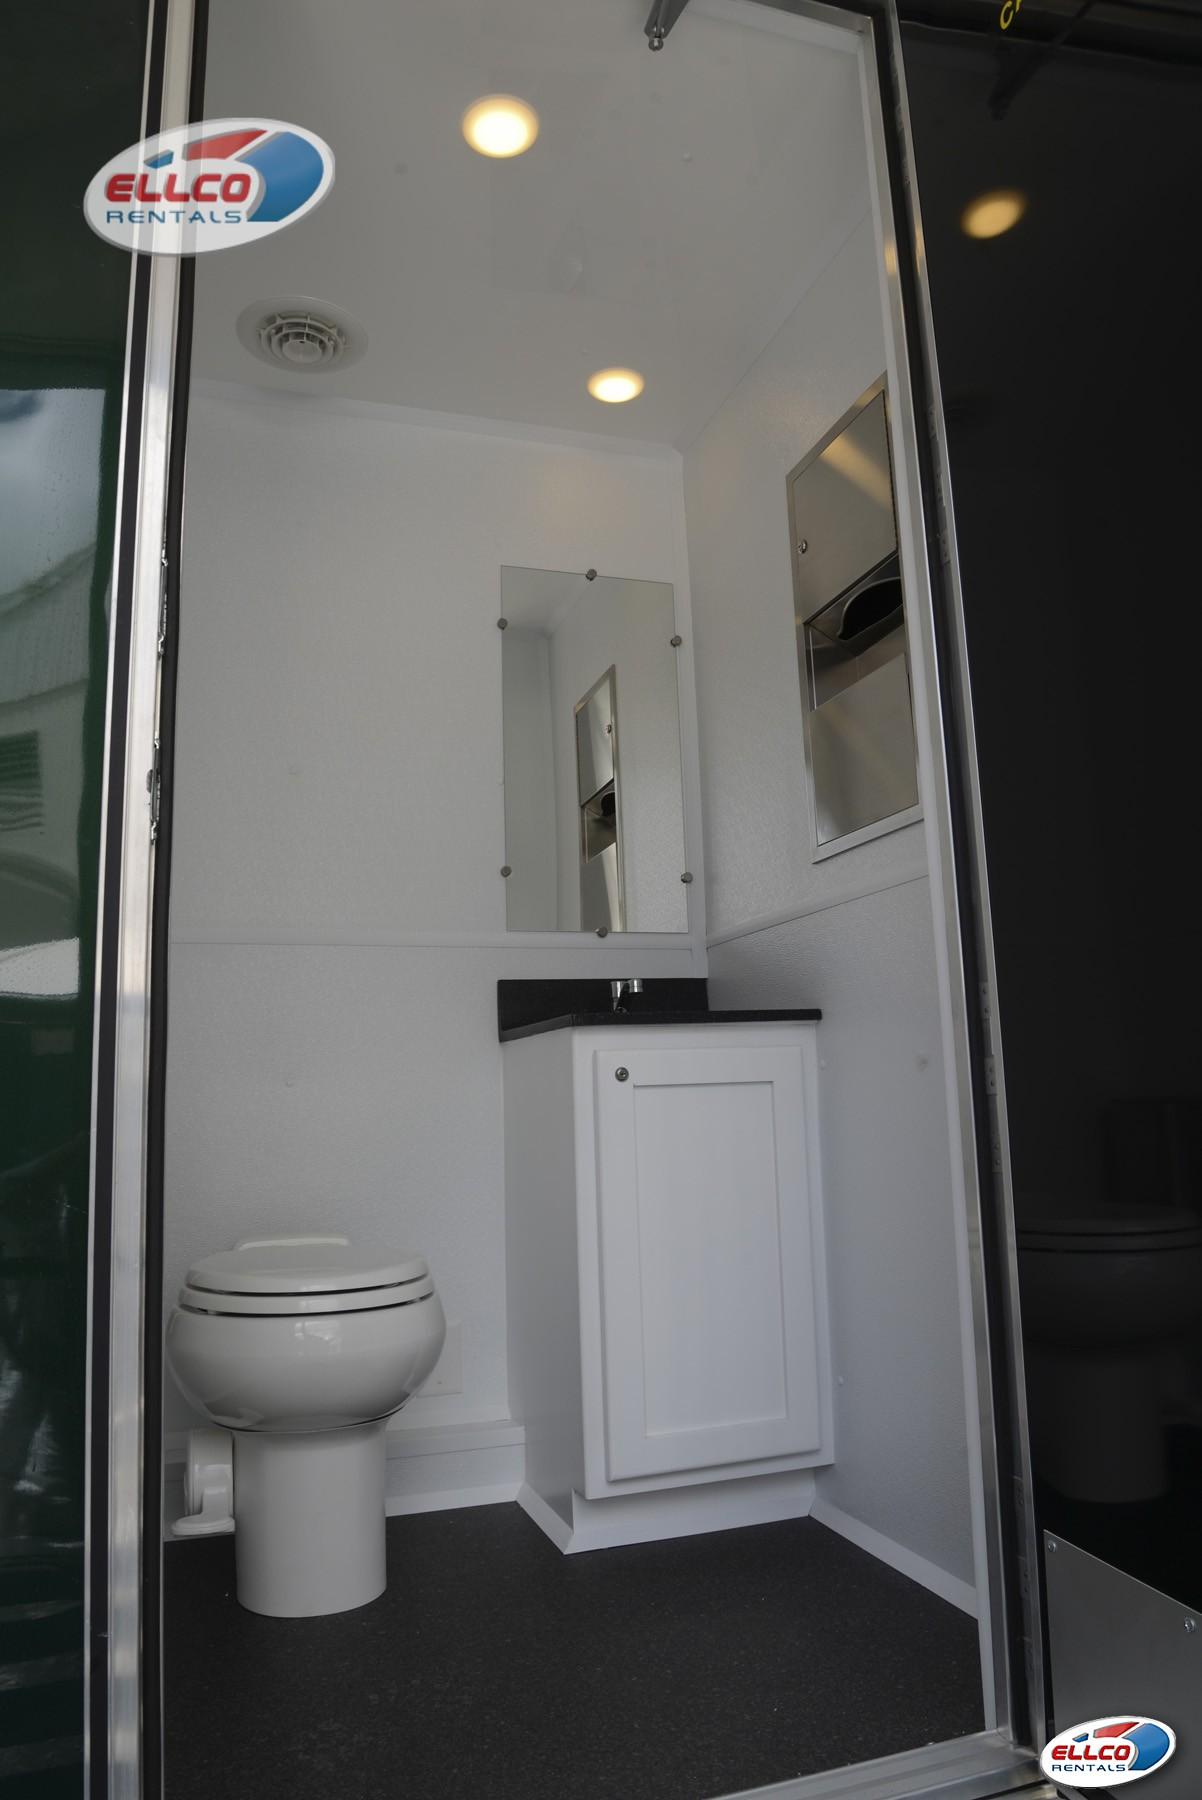 Reveller Restroom Trailer In Portable Sanitation At Ellco Rentals - Bathroom rentals for weddings